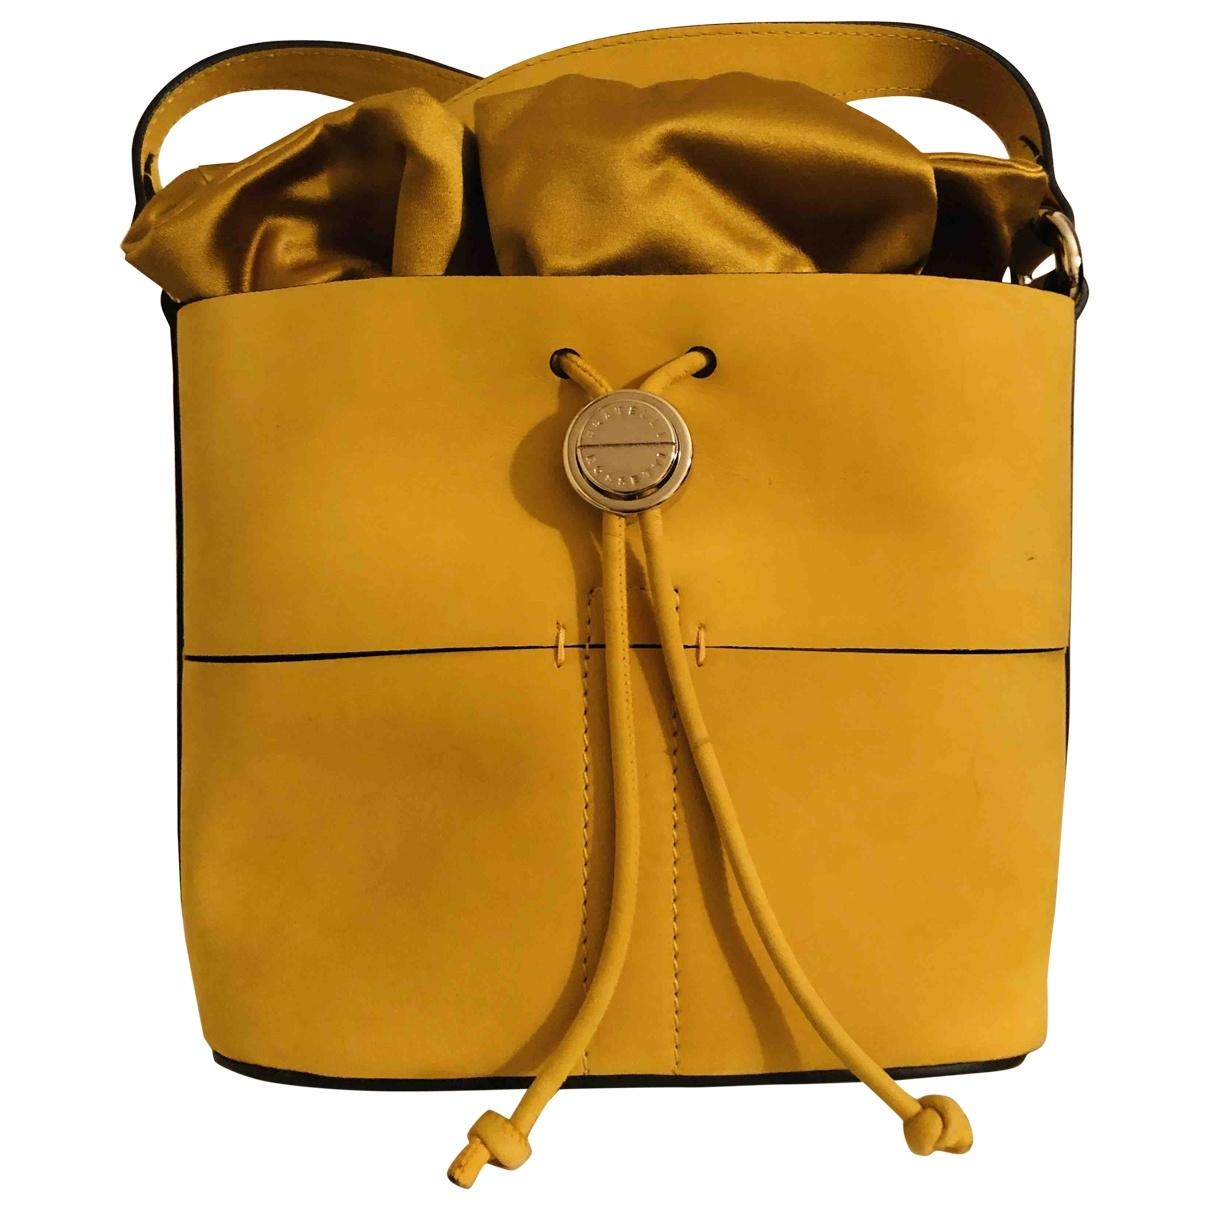 Fratelli Rossetti - Sac a main   pour femme en cuir - jaune